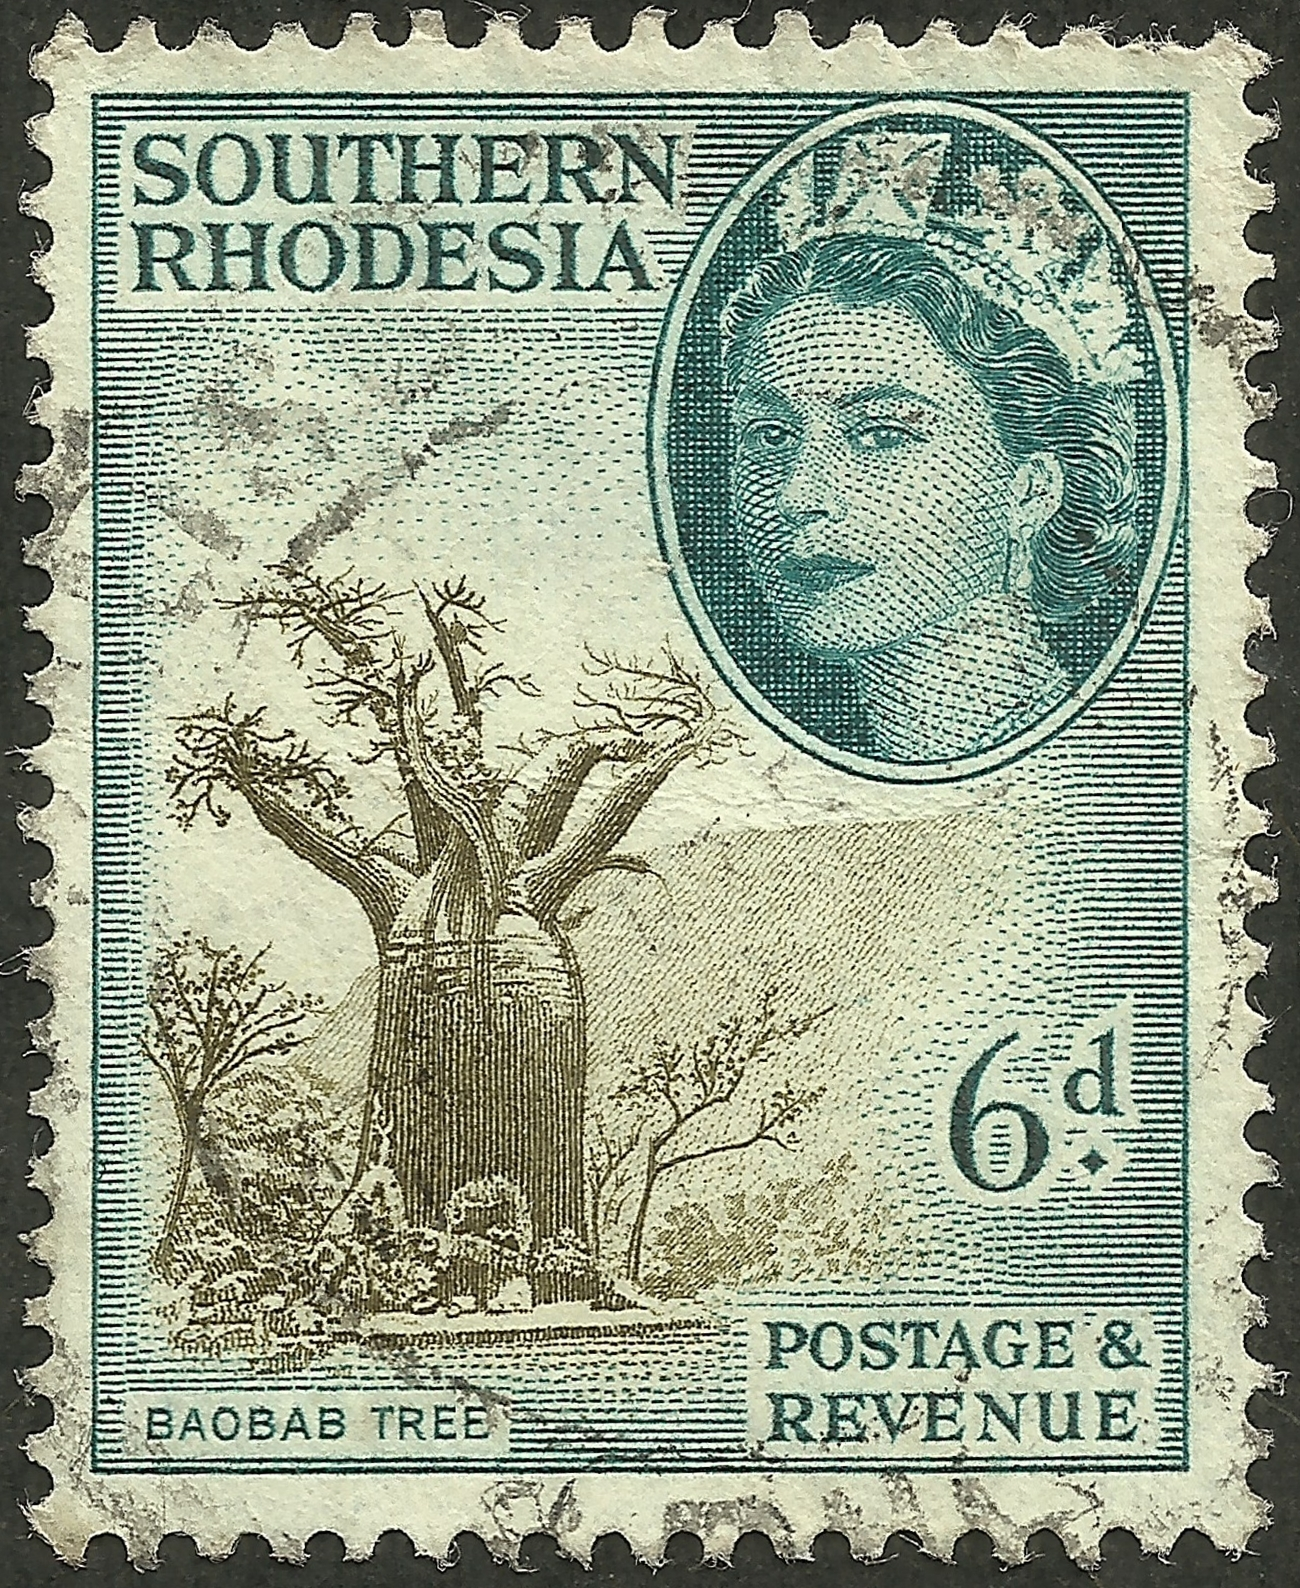 Southern Rhodesia - Scott #87 (1953)